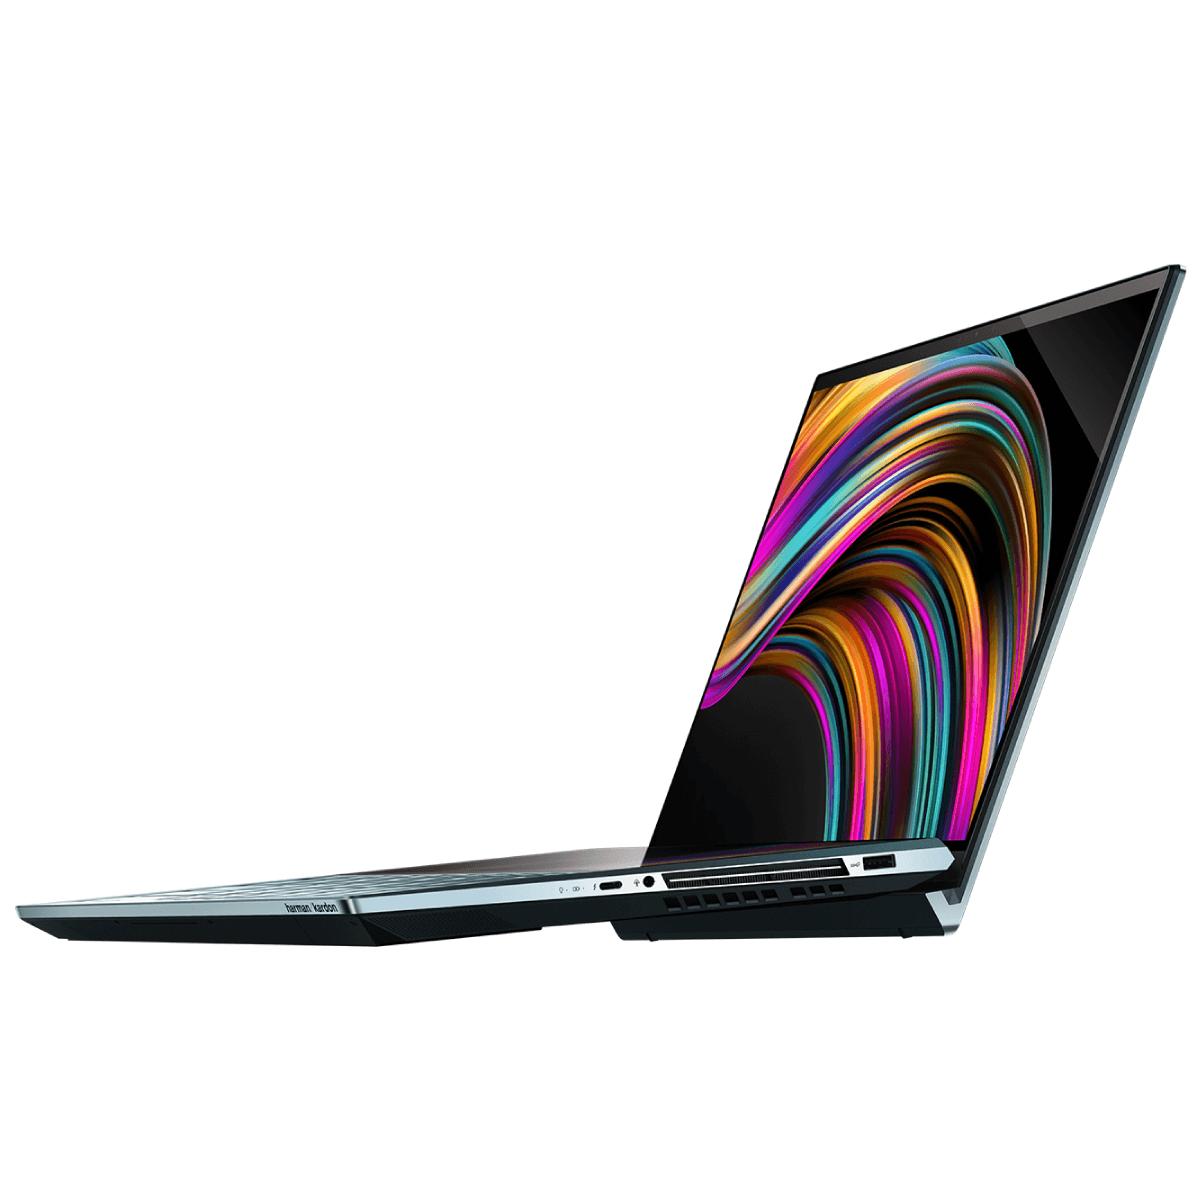 ASUS ZenBook Pro Duo (i9, Celestial Blue)